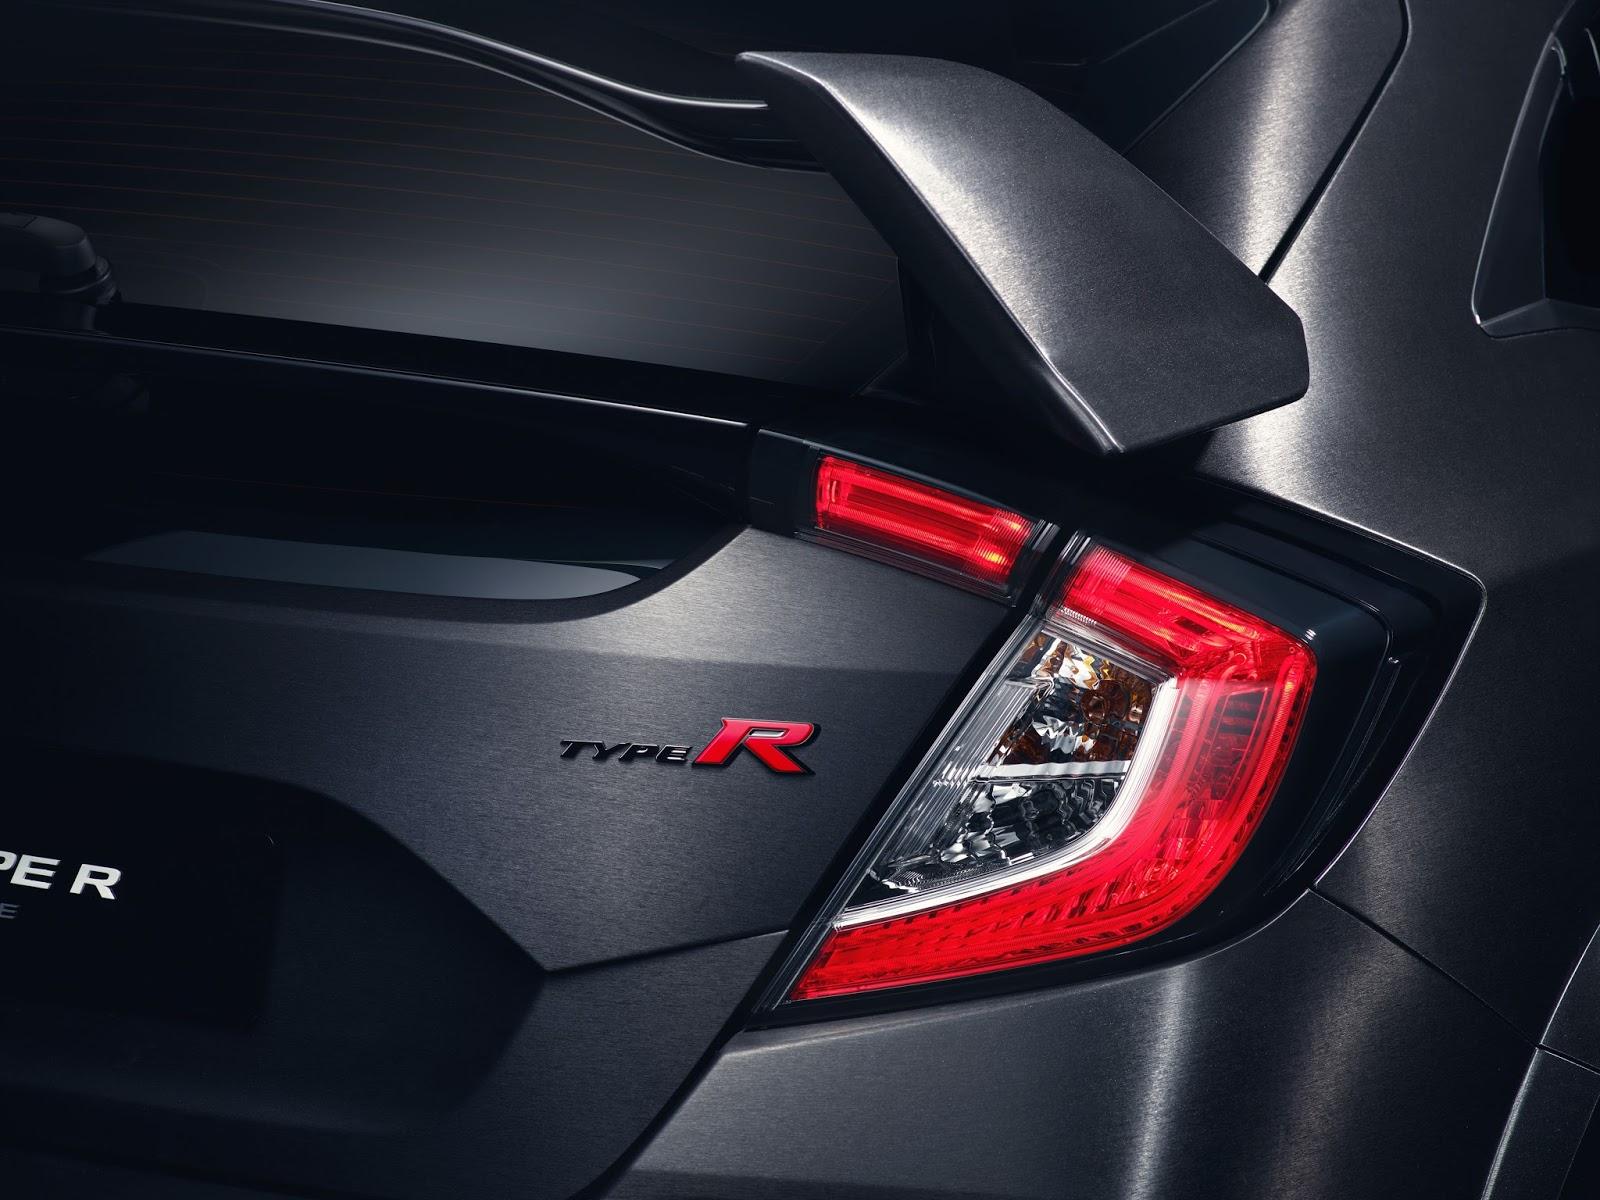 78613 New Civic Type R Prototype breaks cover in Paris